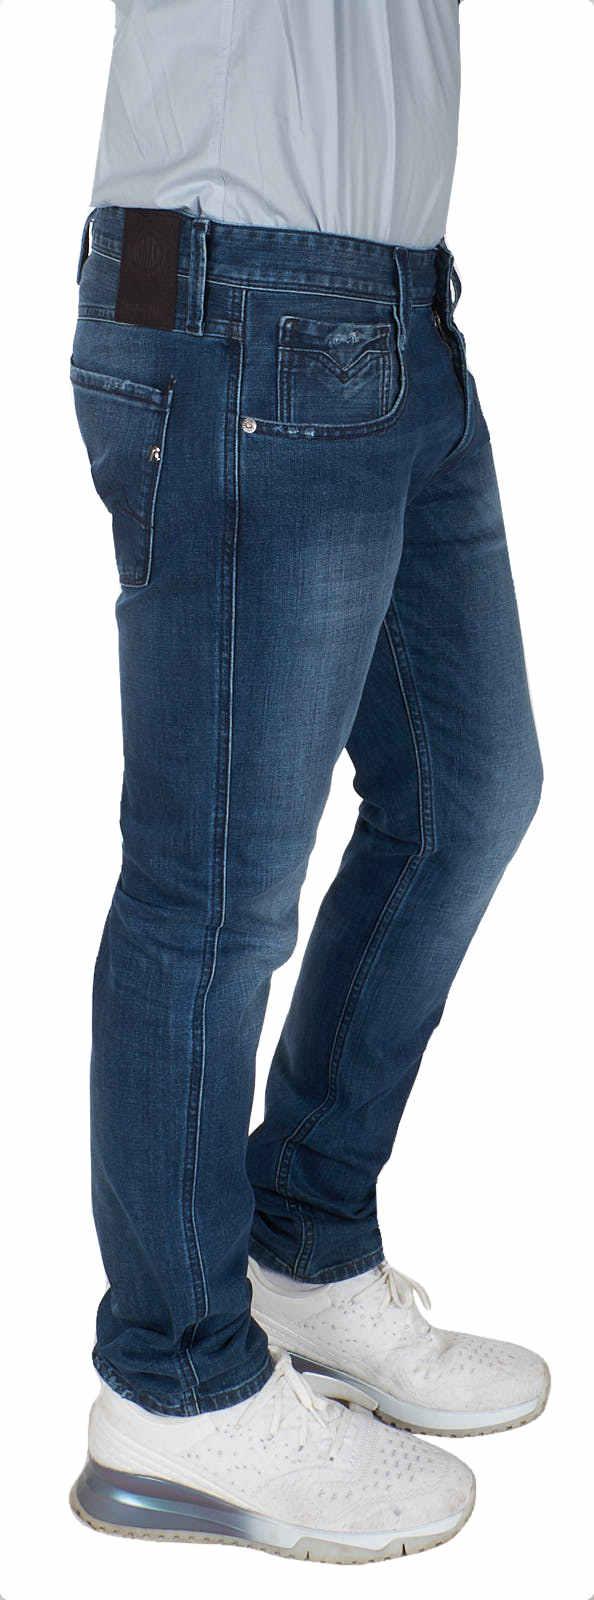 REPLAY-Jeans-Herrren-Anbass-Slim-Fit-Stretch-Hose-Denim-M914Y-000-31D-133